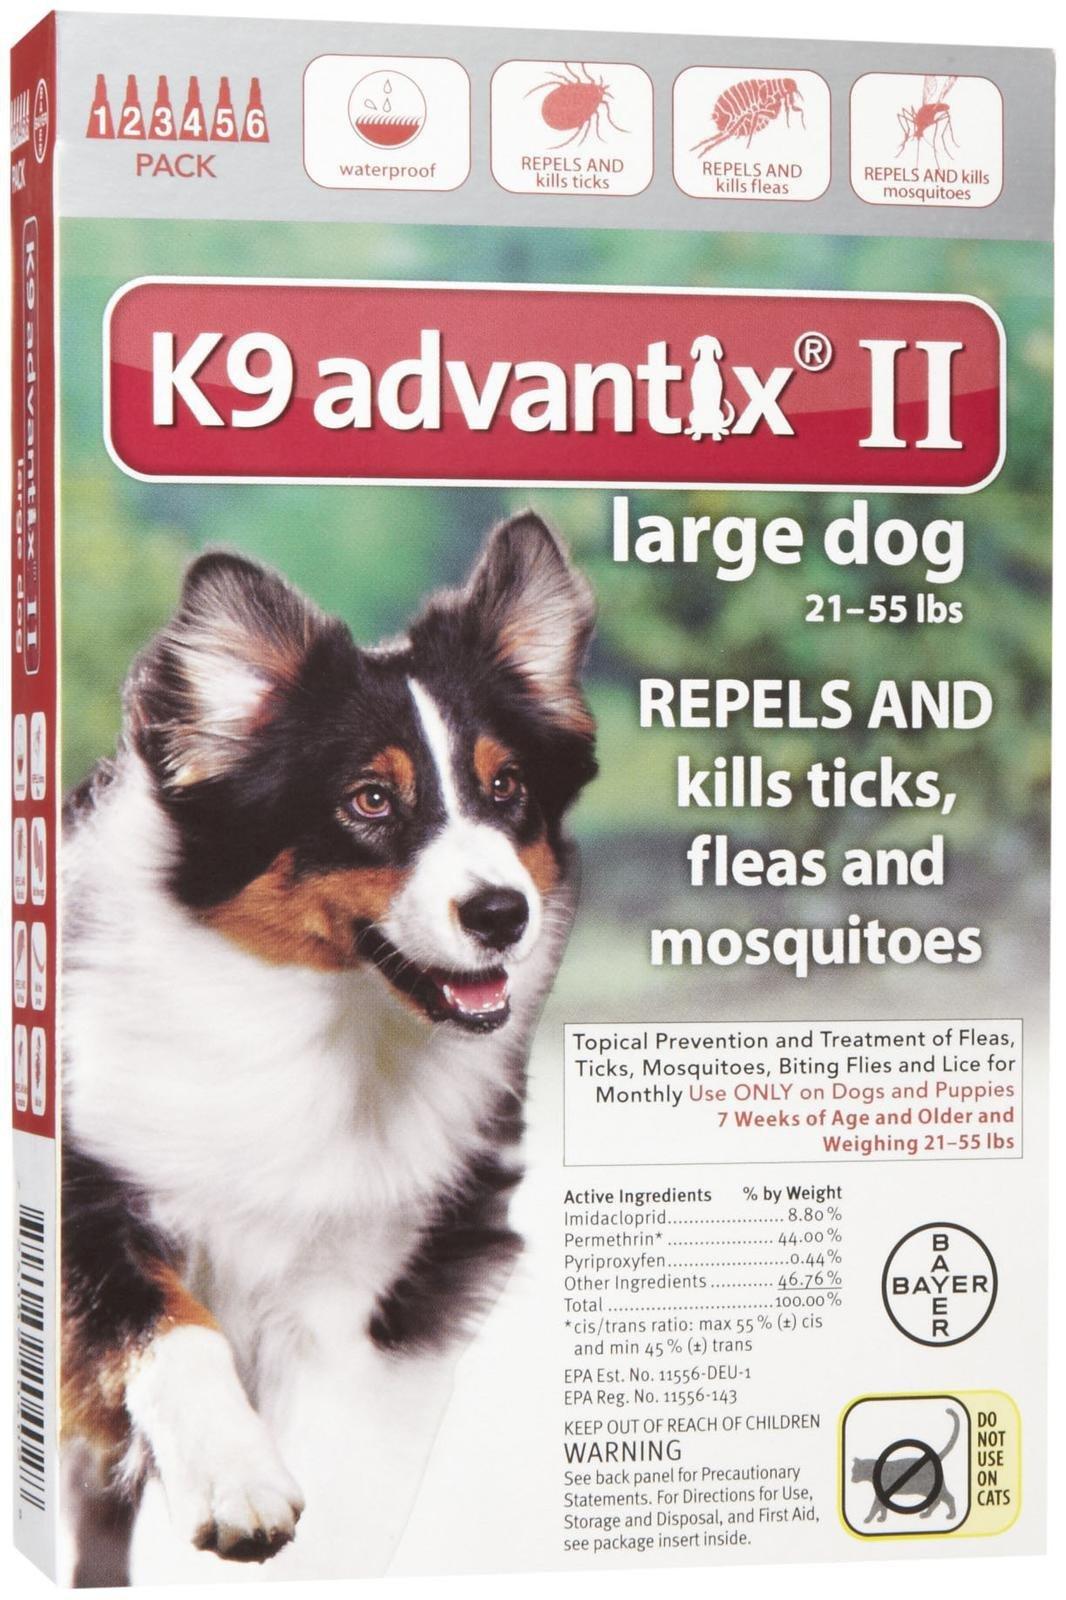 K9 Advantix II Flea and Tick Treatment - Large Dog - 6 Count by Bayer Animal Health